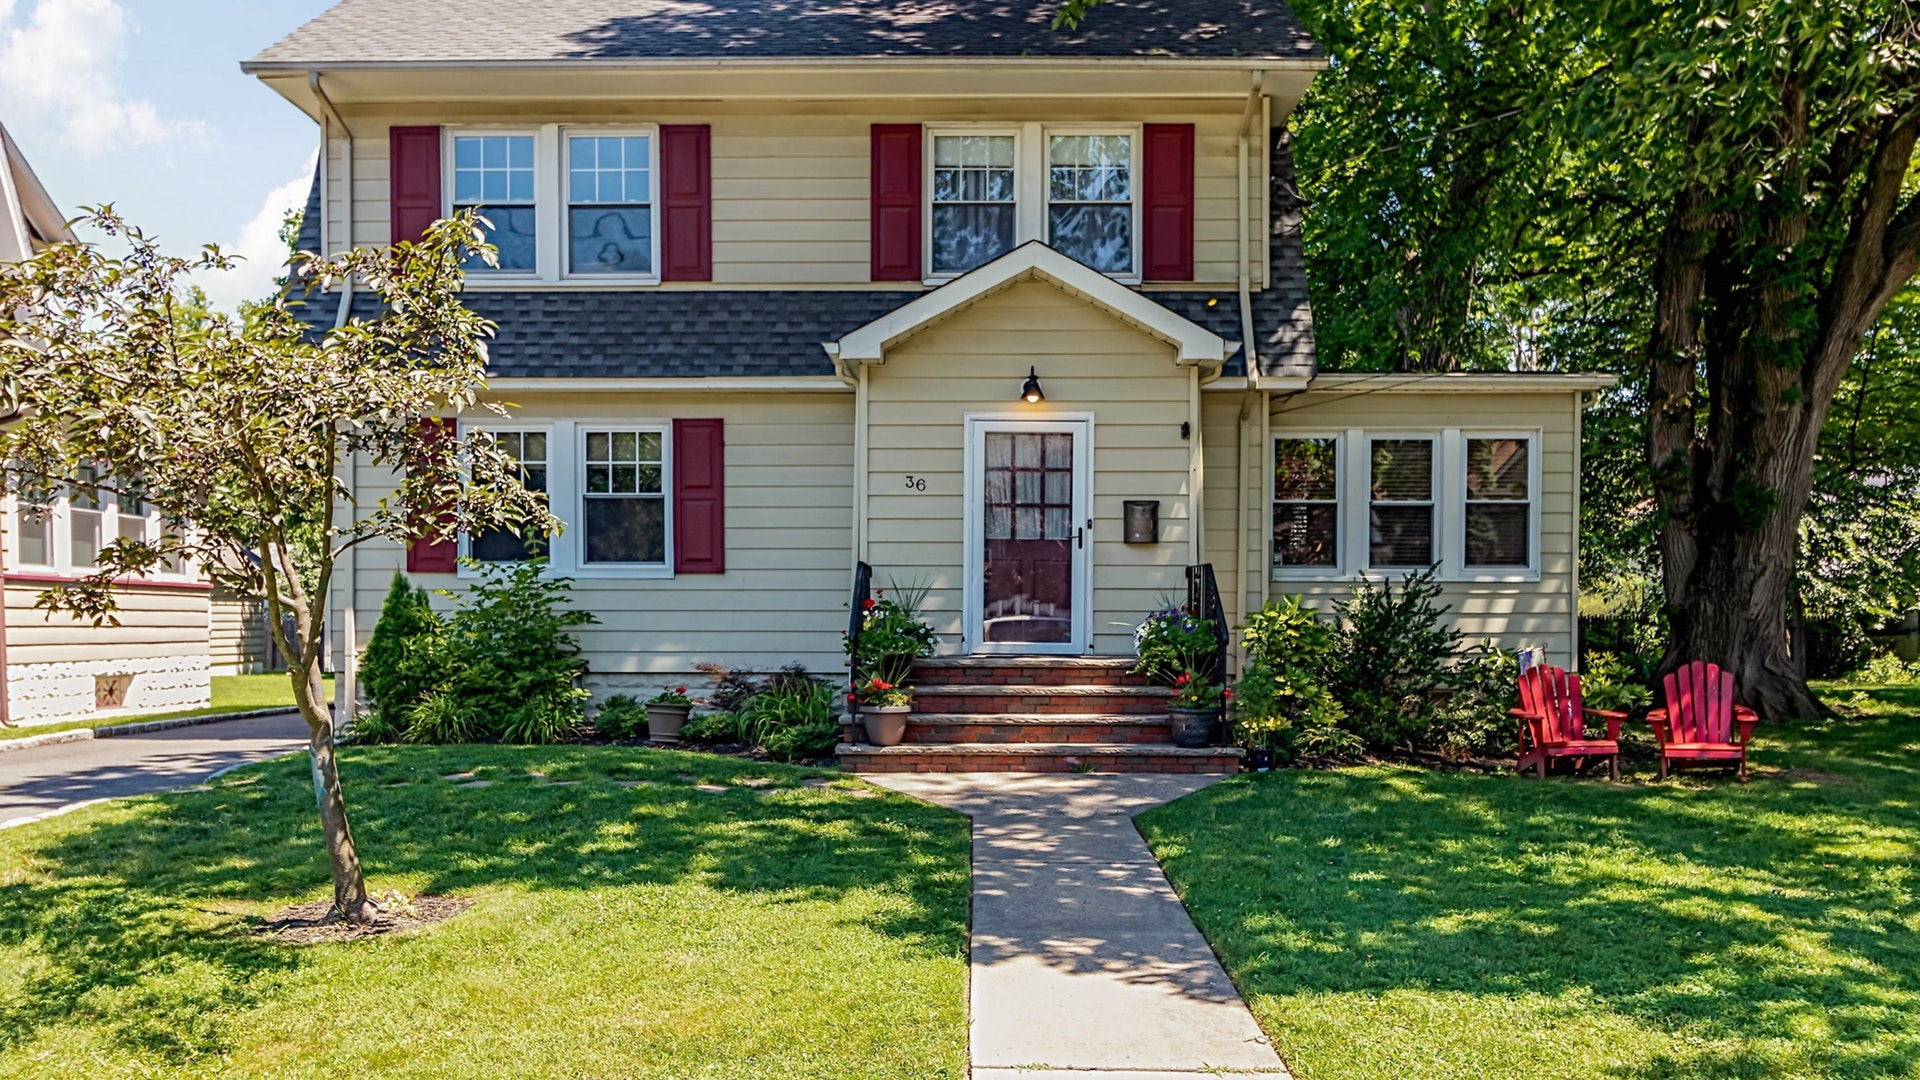 36 Beech Street, Cranford <br /> Sold $575,000